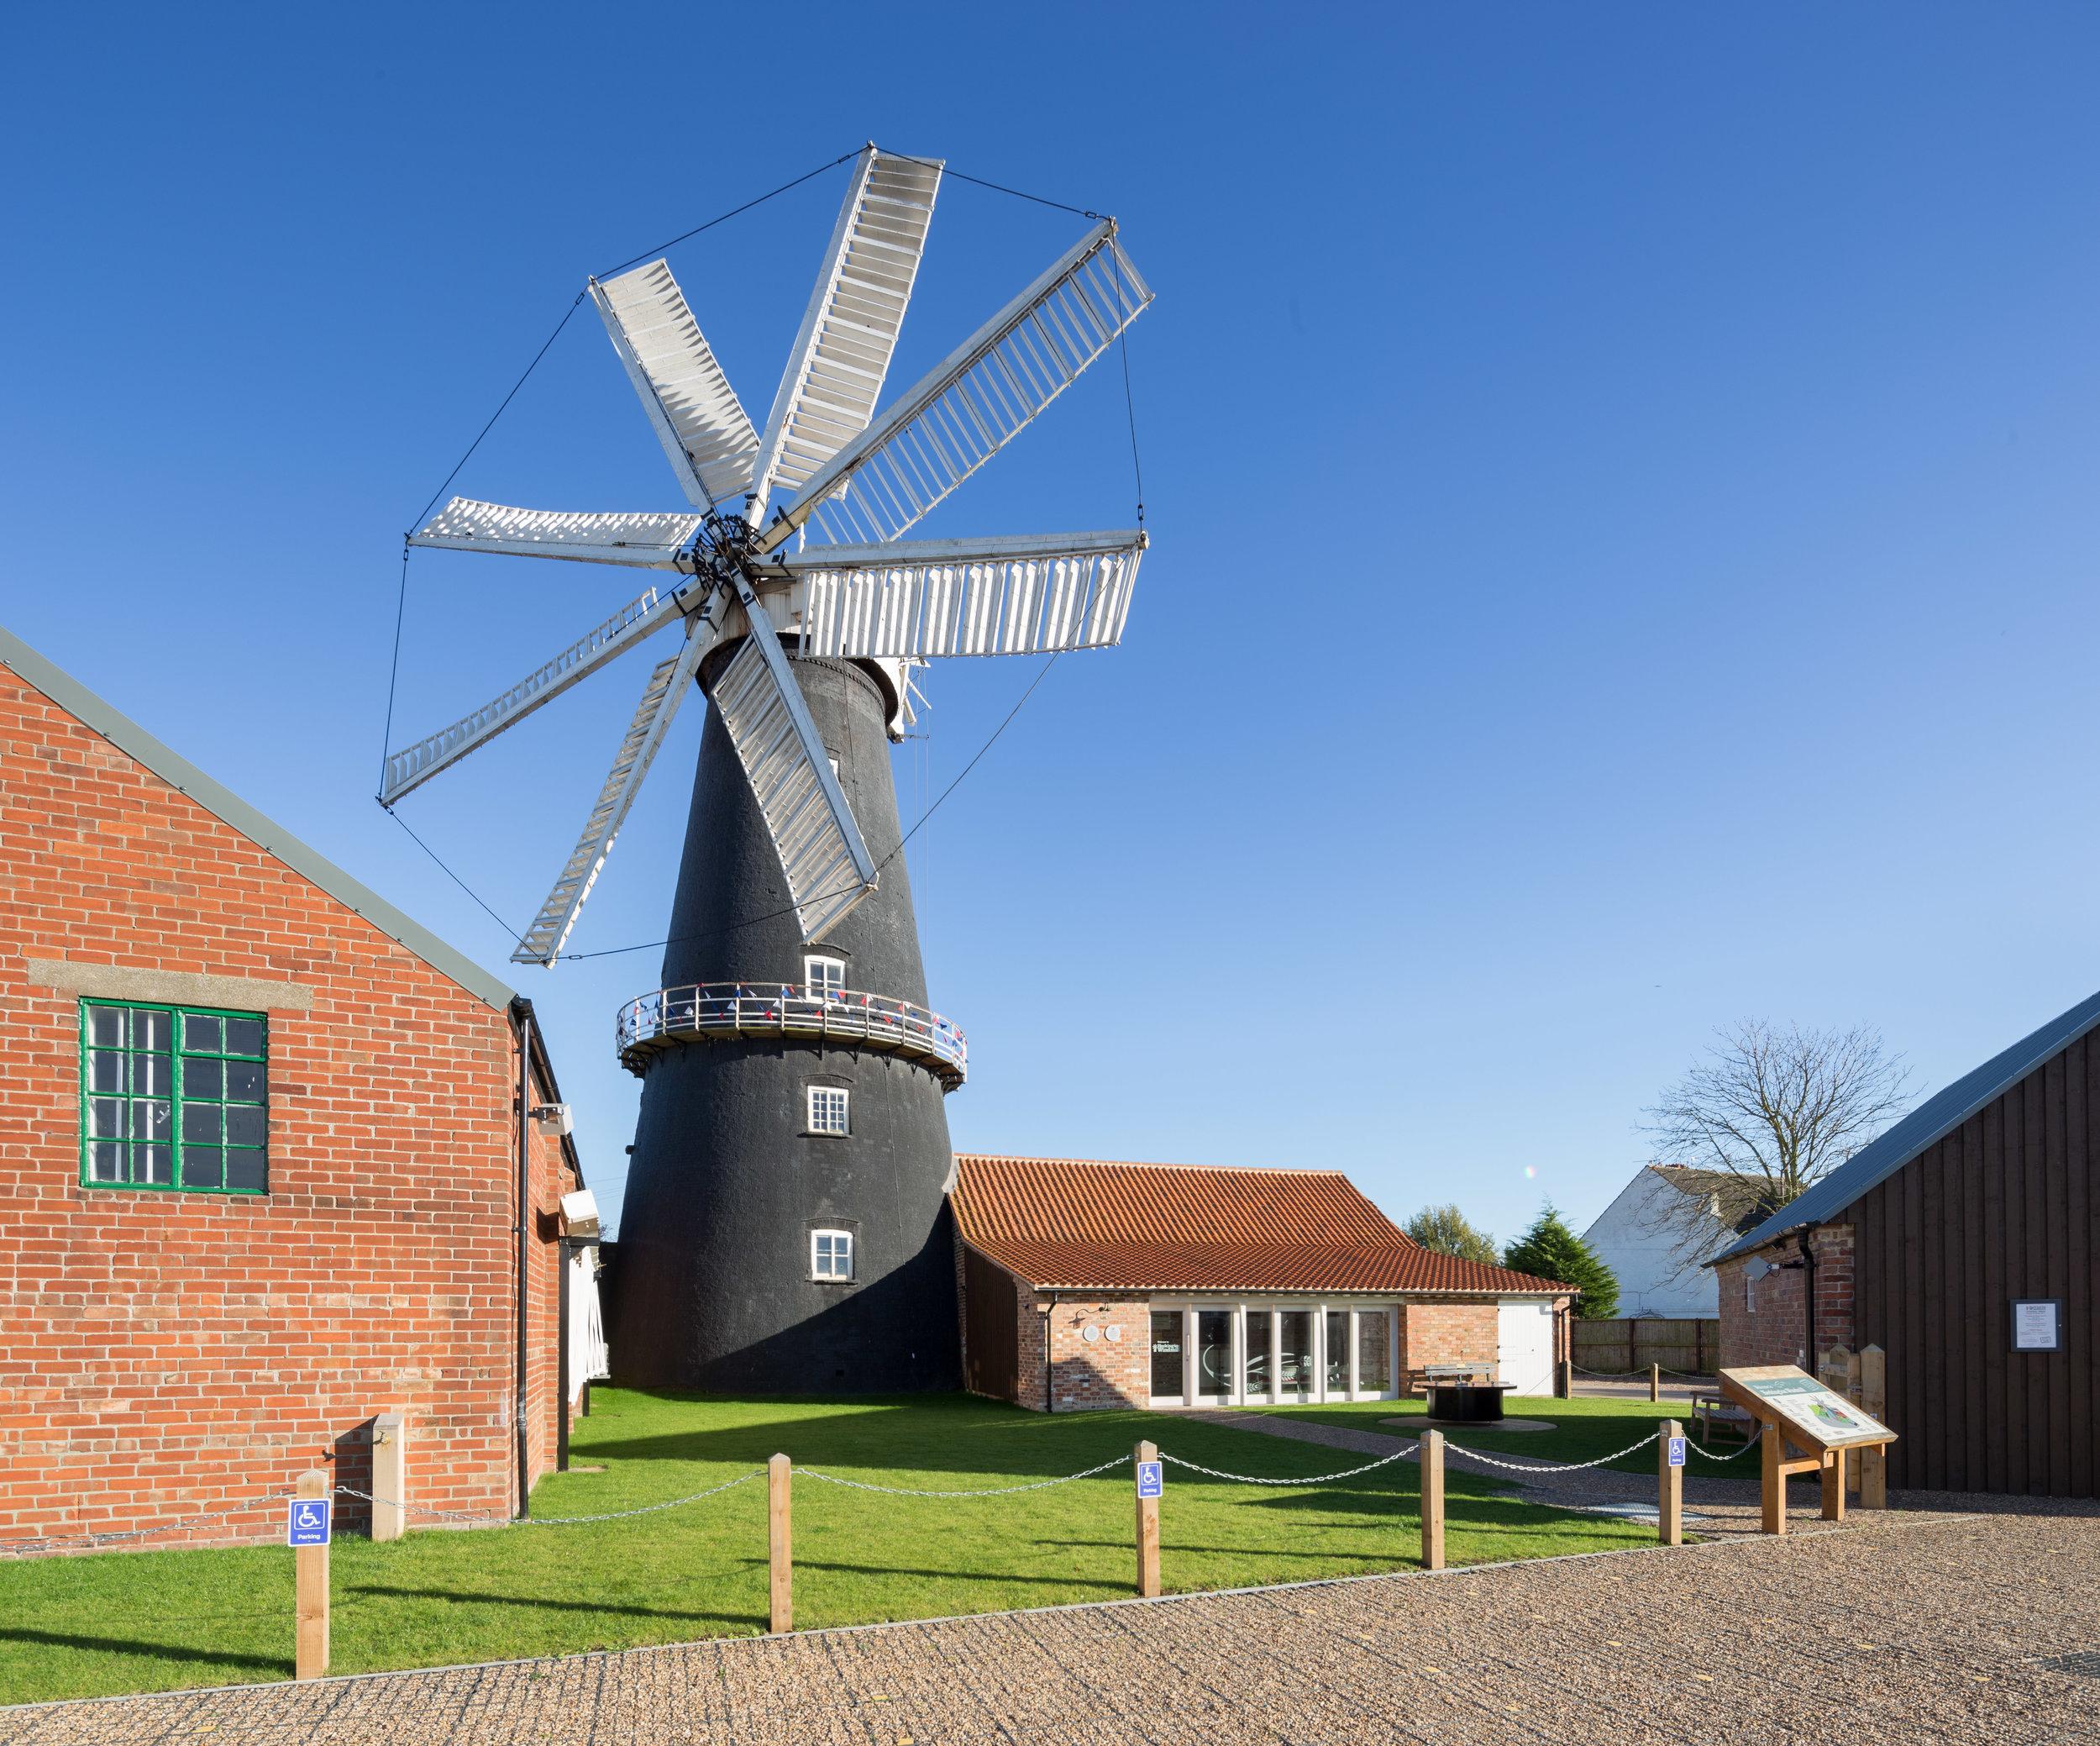 CGA_Heckington Windmill_IMG_8576-HDR-Pano.jpg